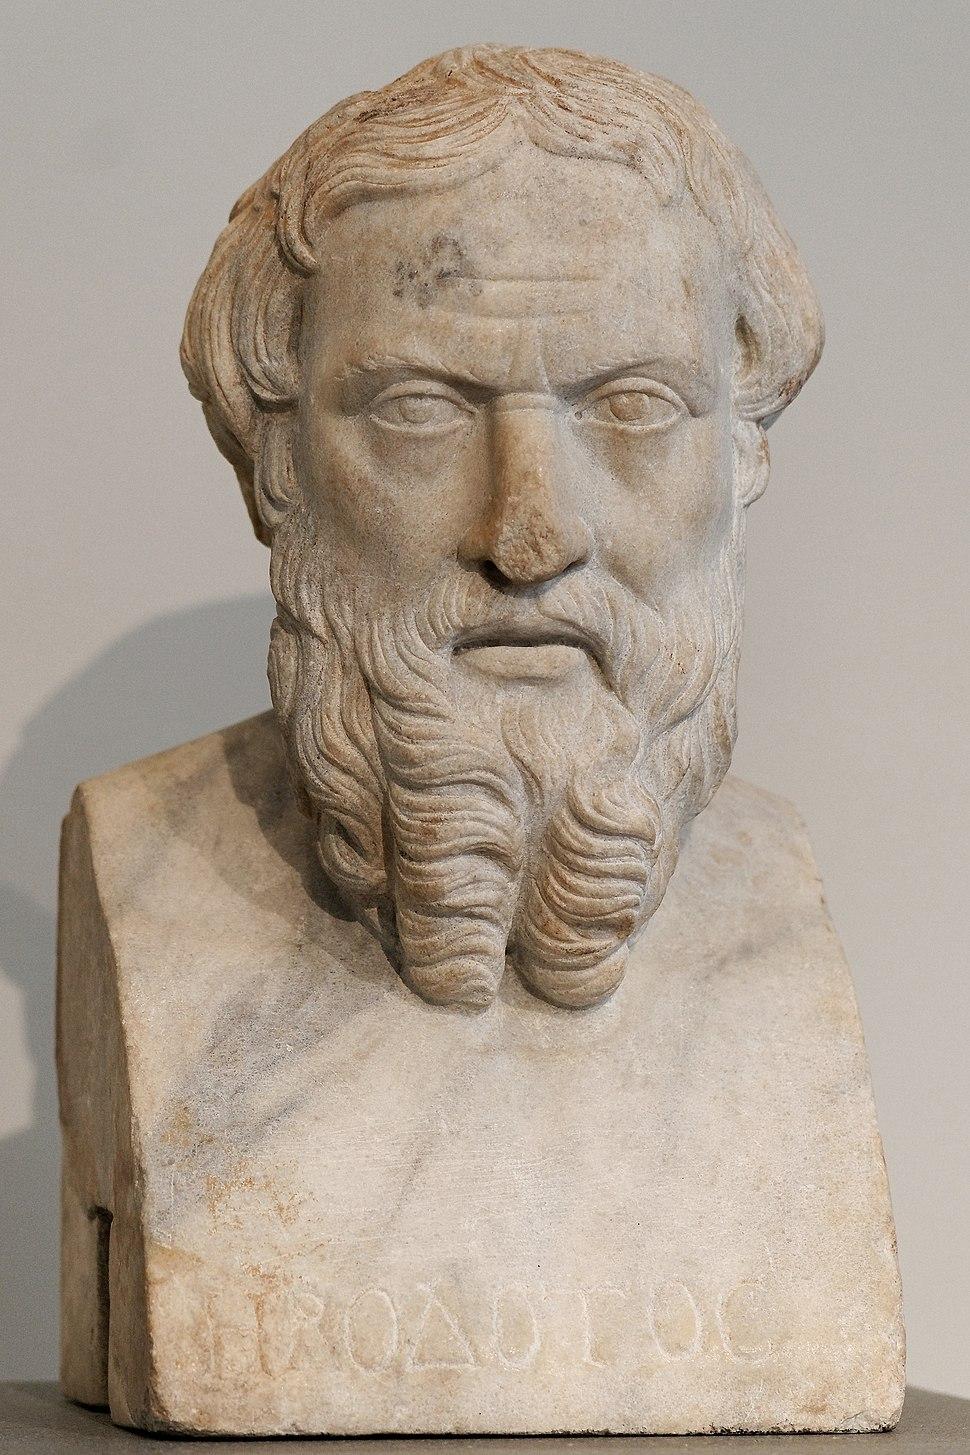 Herodotos Met 91.8